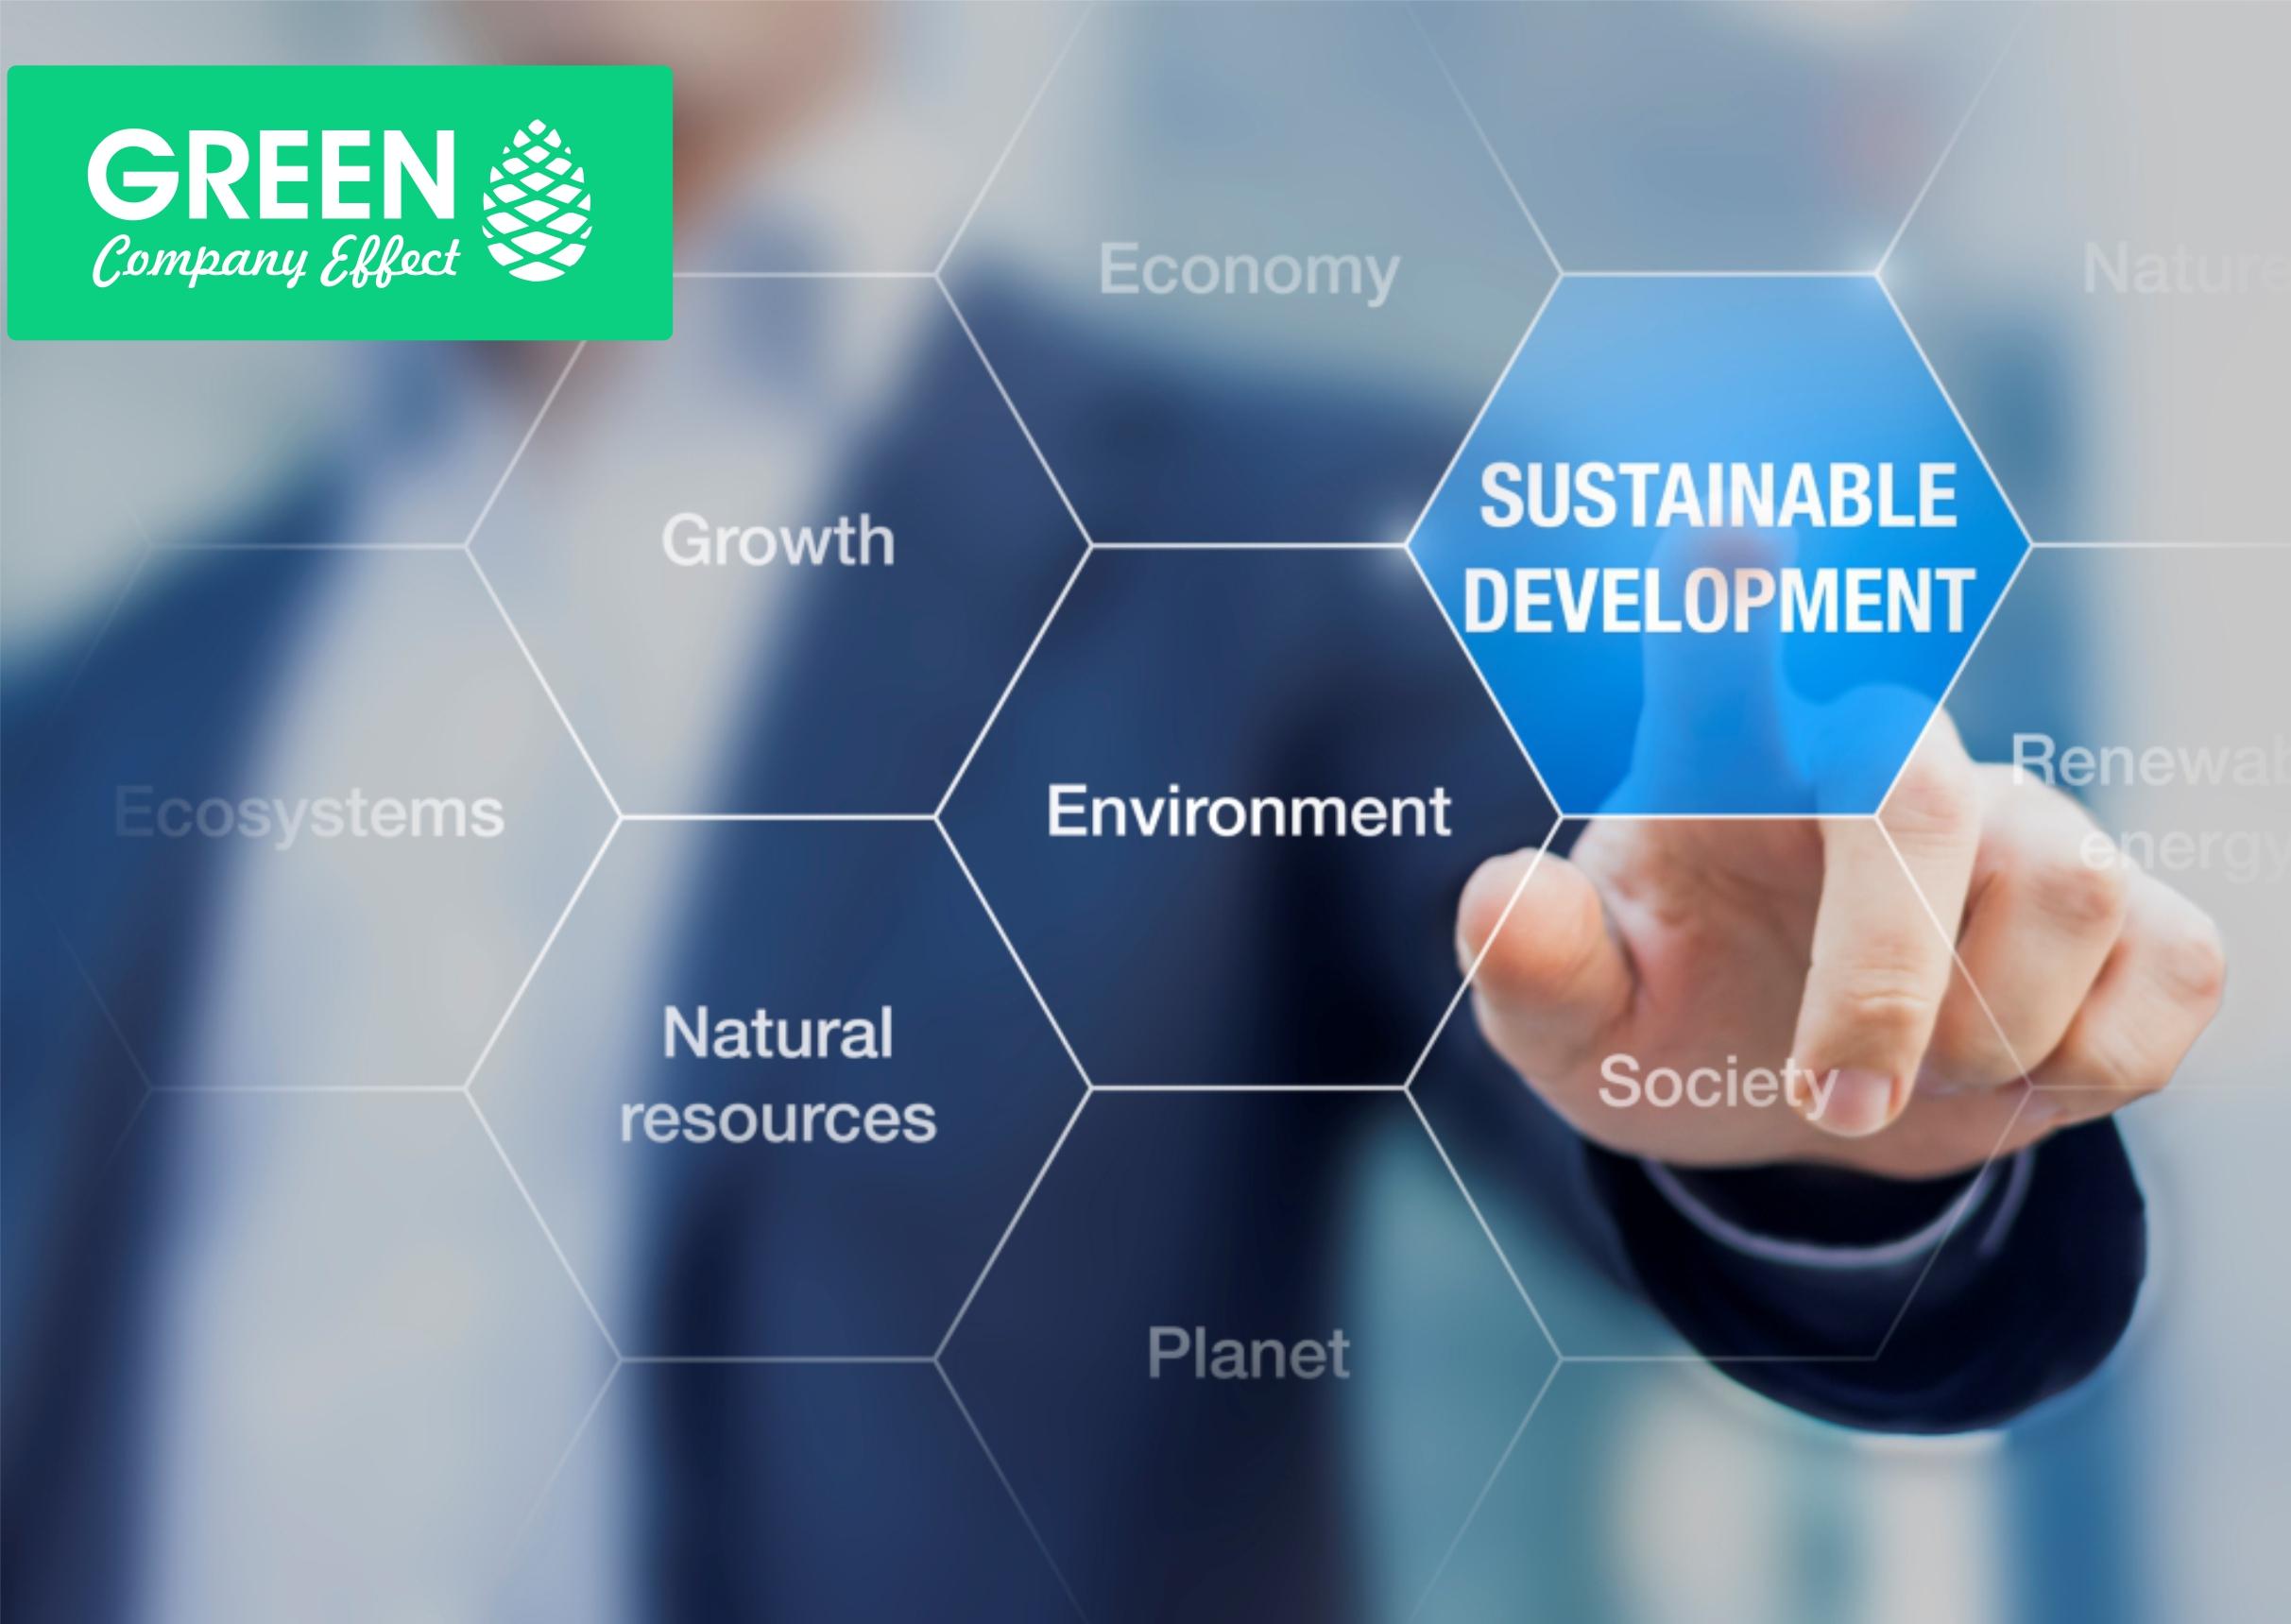 gce sustainabledevelopment.jpg